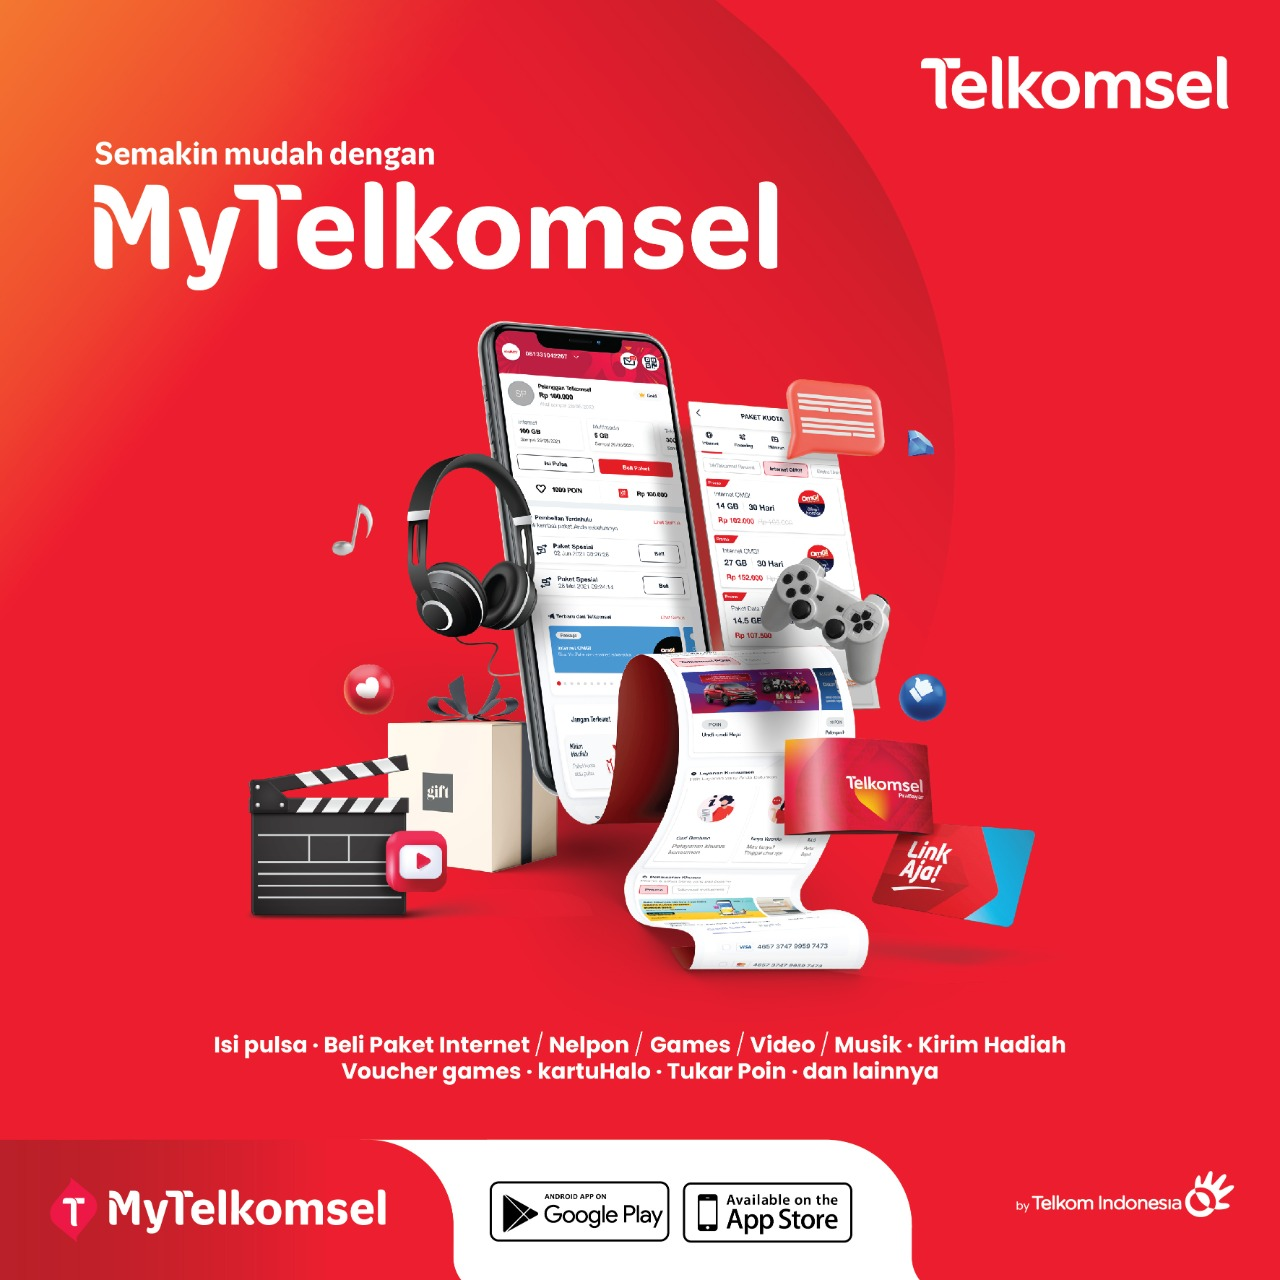 paket-internet-cepat-murah-product-myTELKOMSEL-20210713094524.jpg